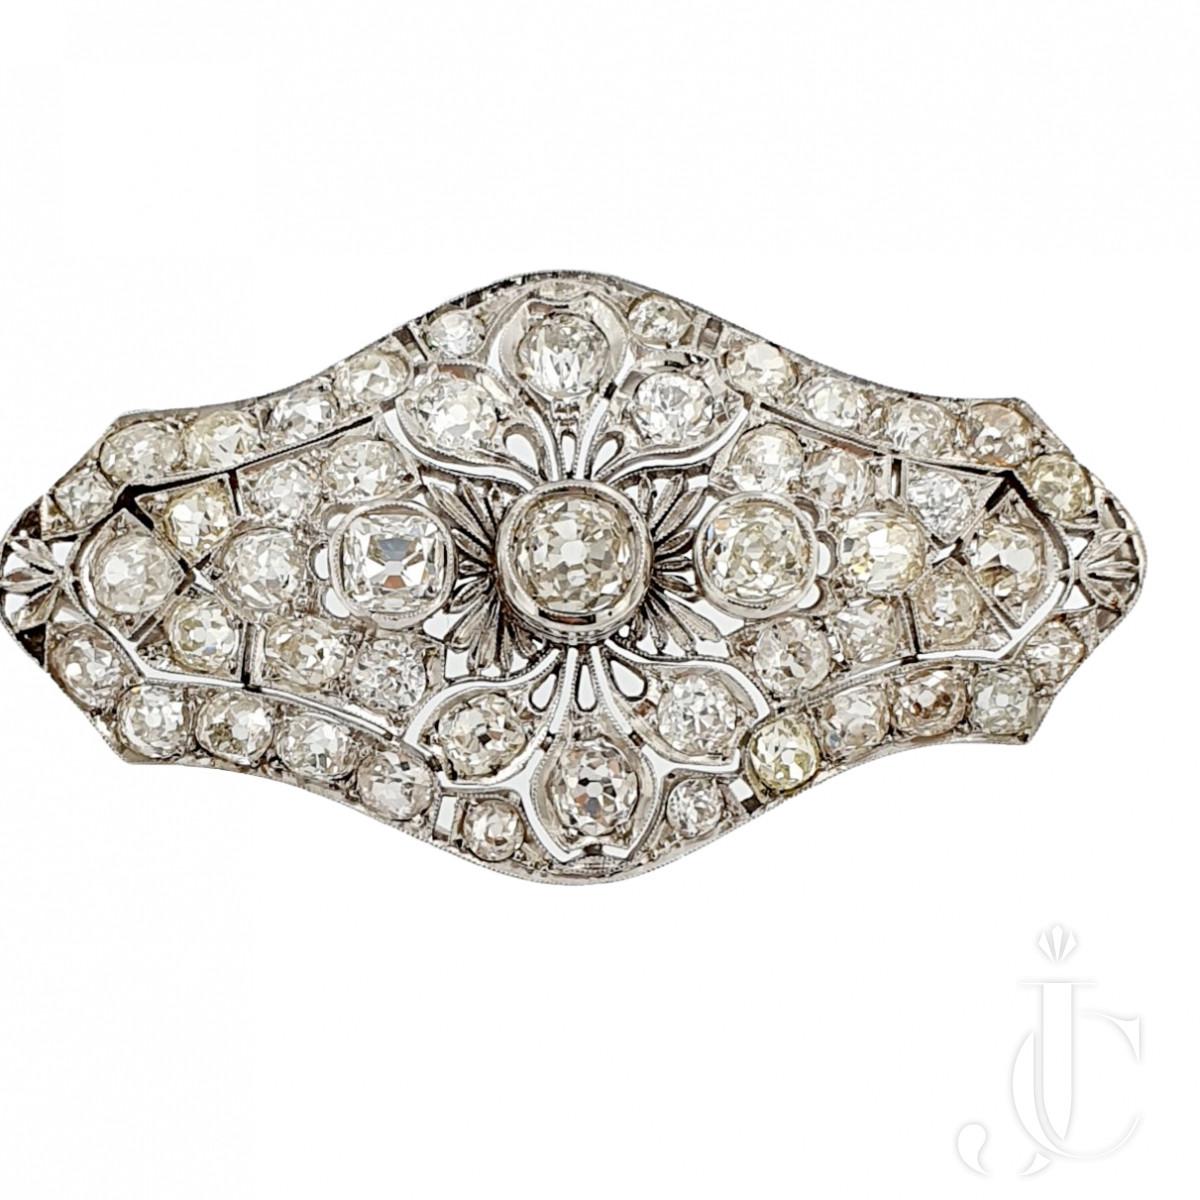 Old Cut Diamond Brooch cum Pendant